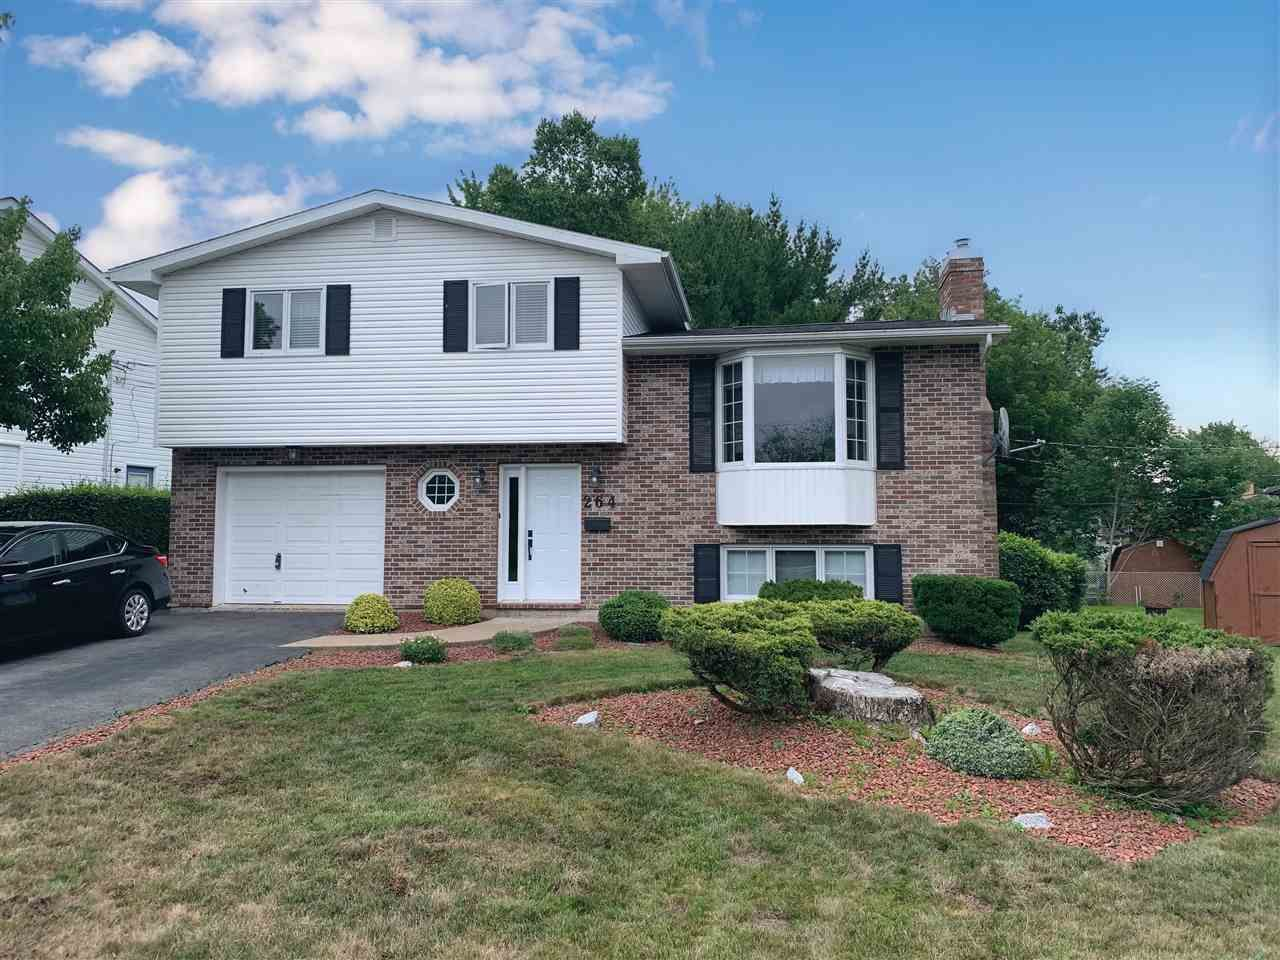 Main Photo: 264 CHANDLER Drive in Lower Sackville: 25-Sackville Residential for sale (Halifax-Dartmouth)  : MLS®# 202013165